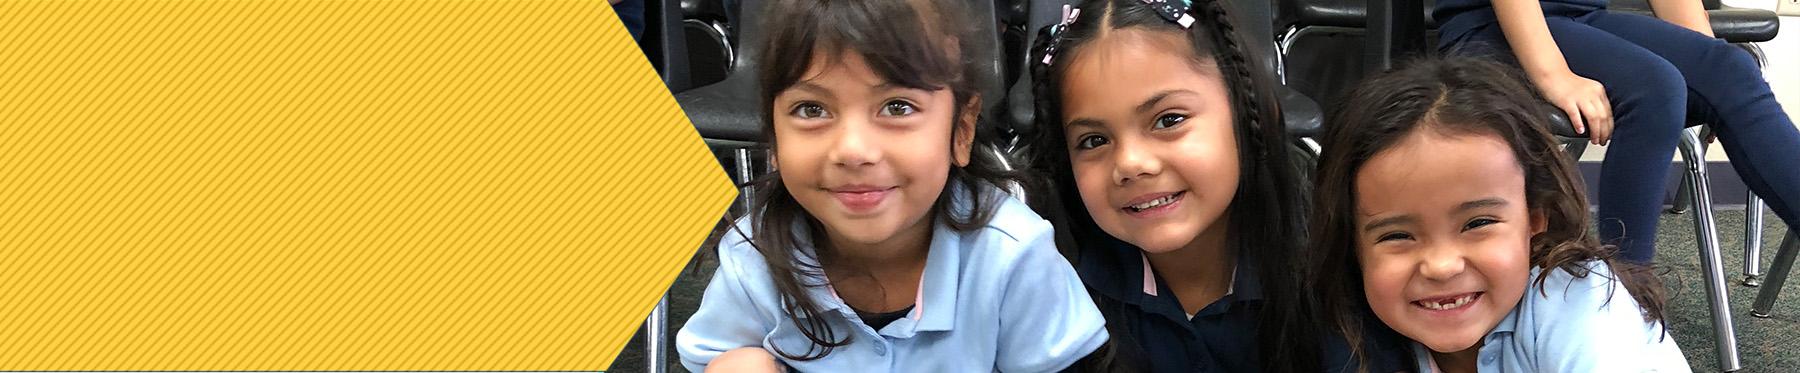 Three happy Sun Canyon Elementary School school girls